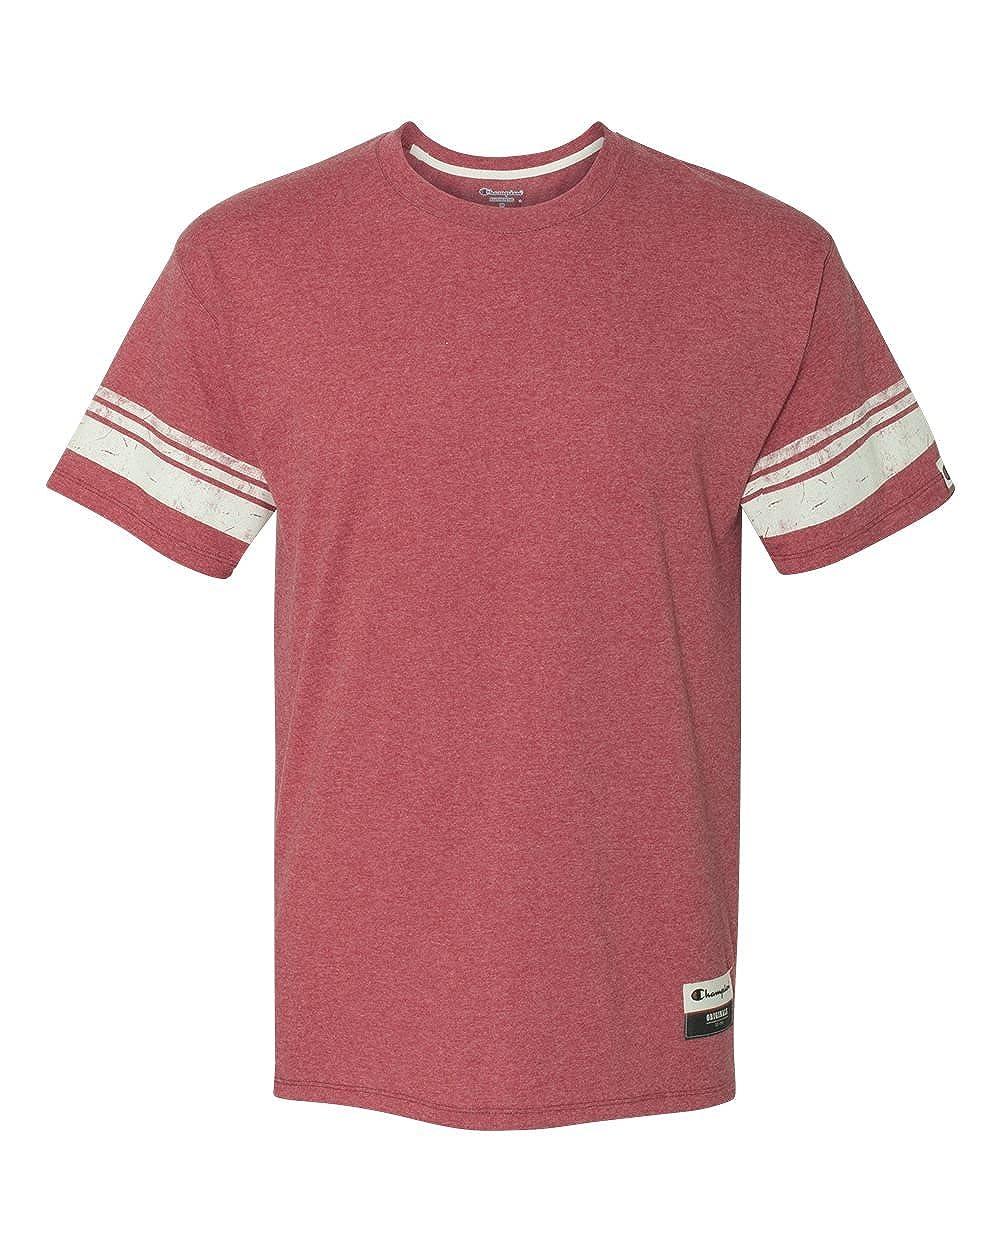 Champion Mens Authentic Originals Tri-blend Short Sleeve Varsity Tee